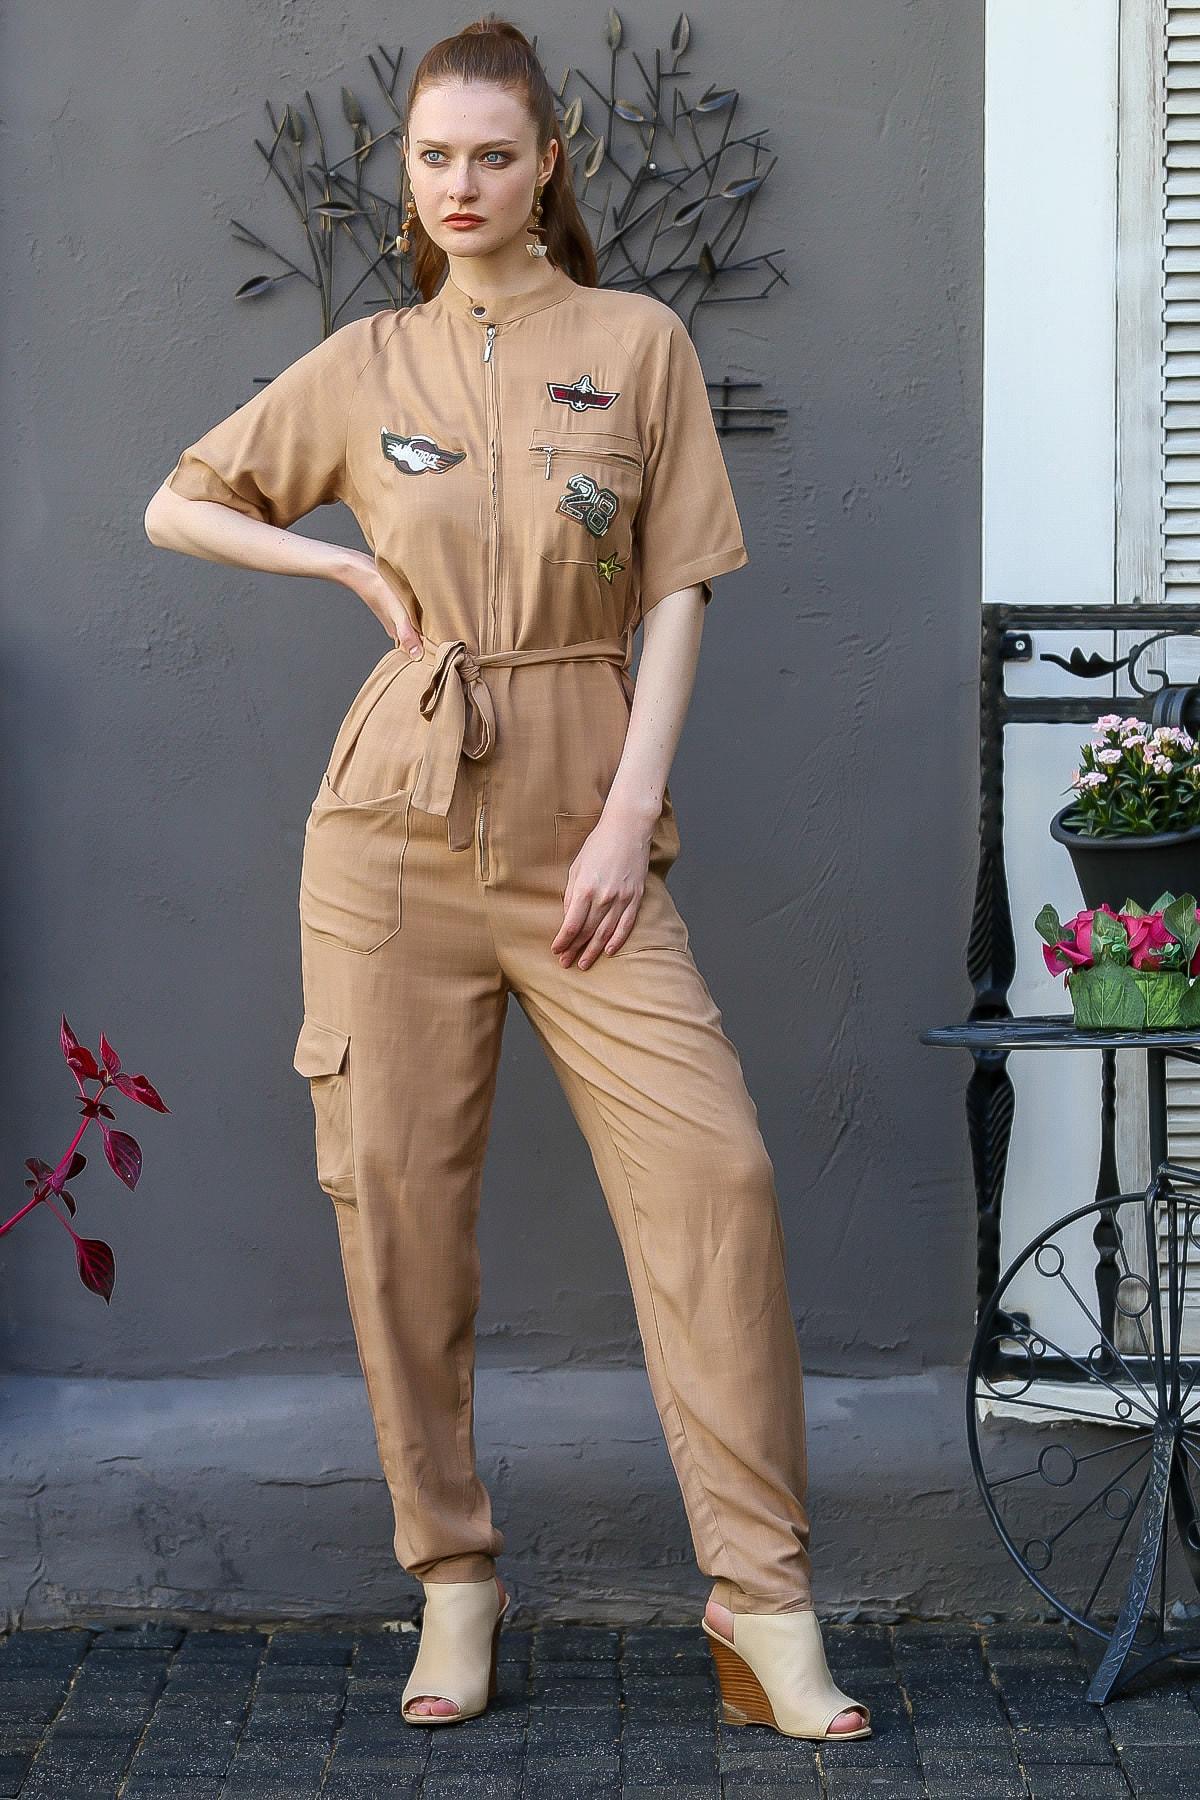 Chiccy Kadın Taba Military Aplike Detaylı Fermuarlı Cepli Kuşaklı Dokuma Tulum M10160000El94801